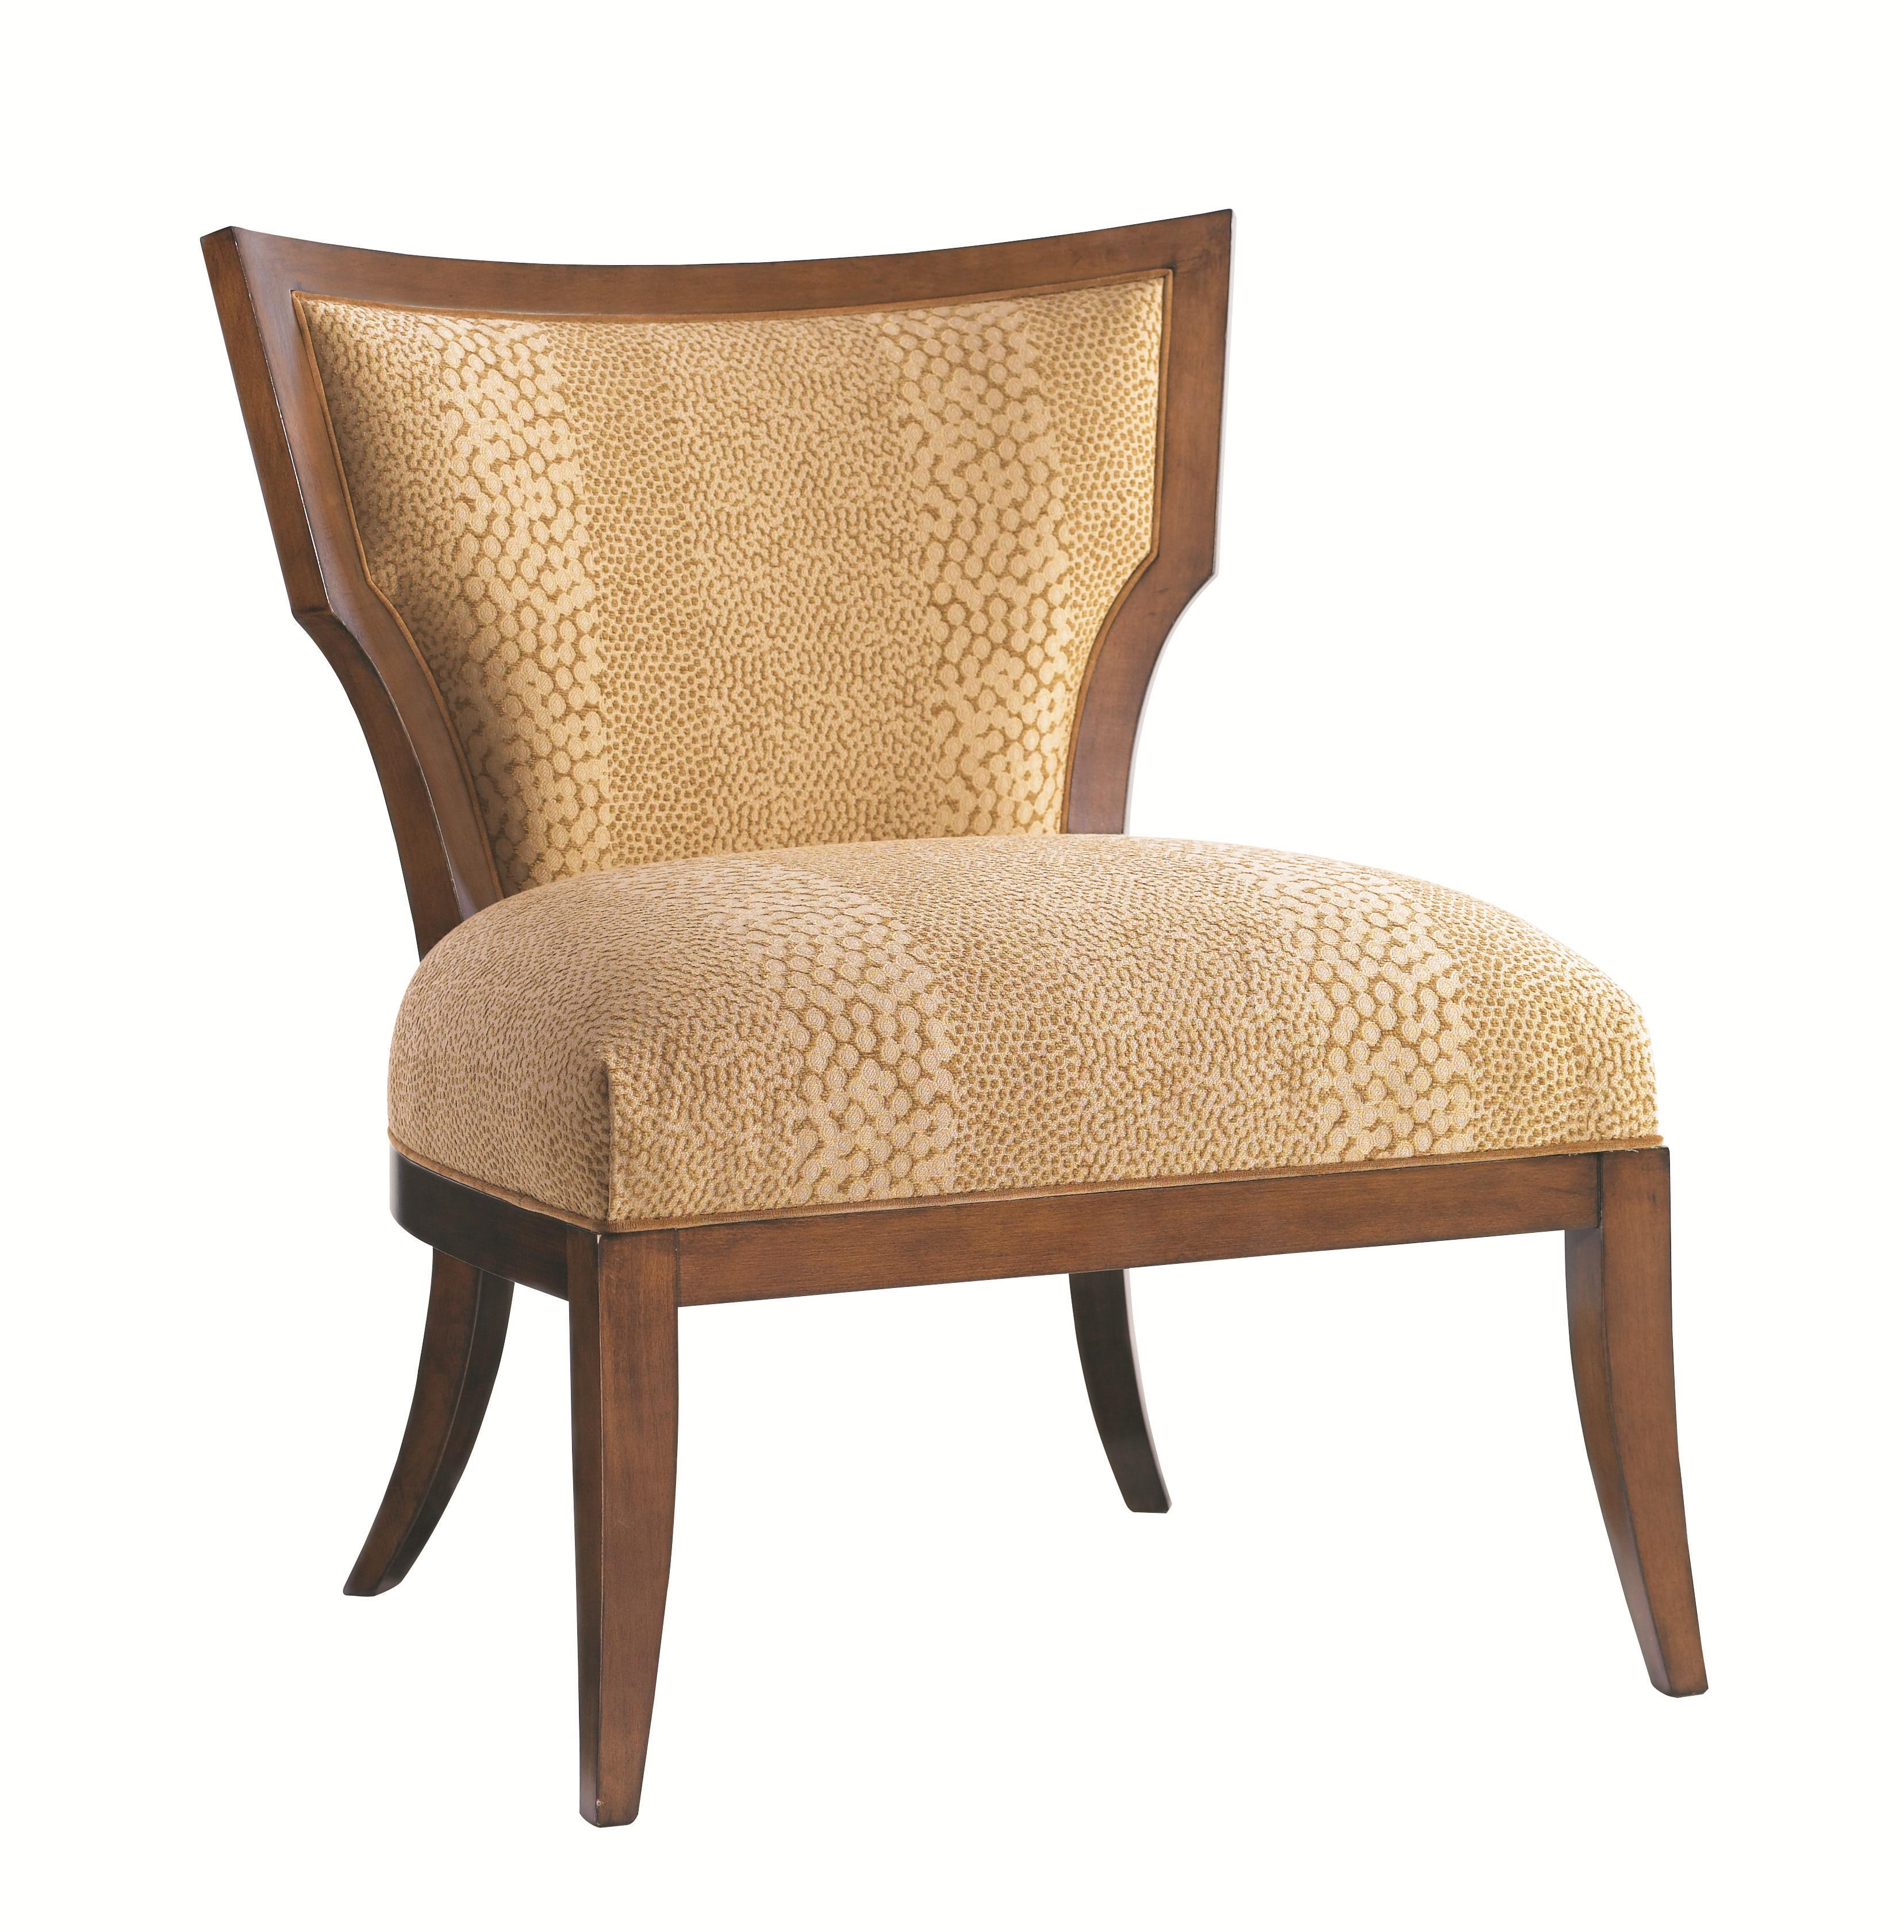 Aquarius Gigi <b>Customizable</b> Chair by Aquarius at Baer's Furniture